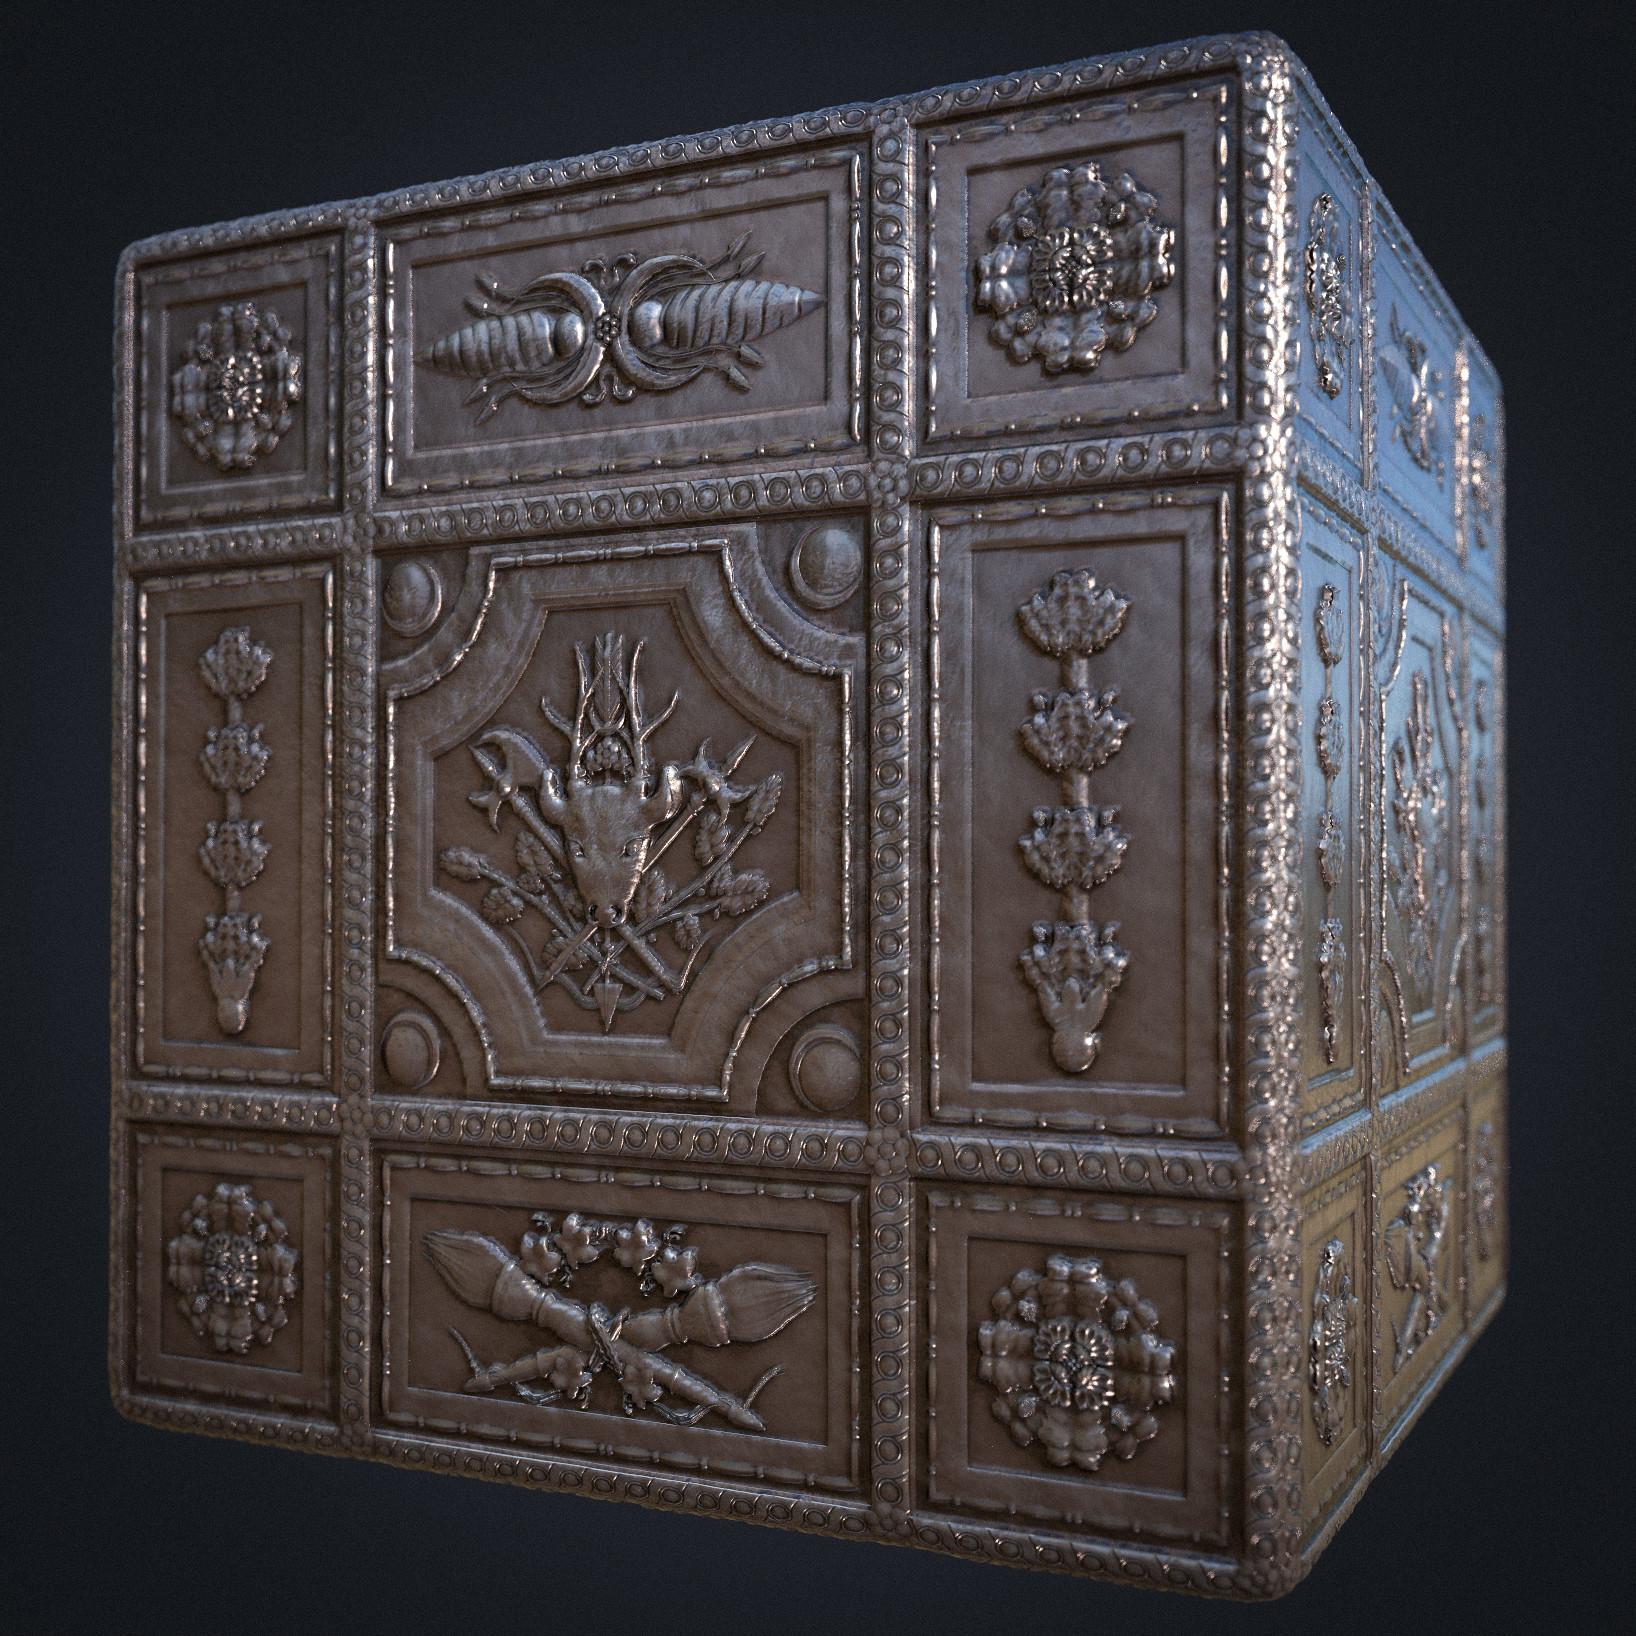 Chris injae choi deerhex cube 12 1 2018